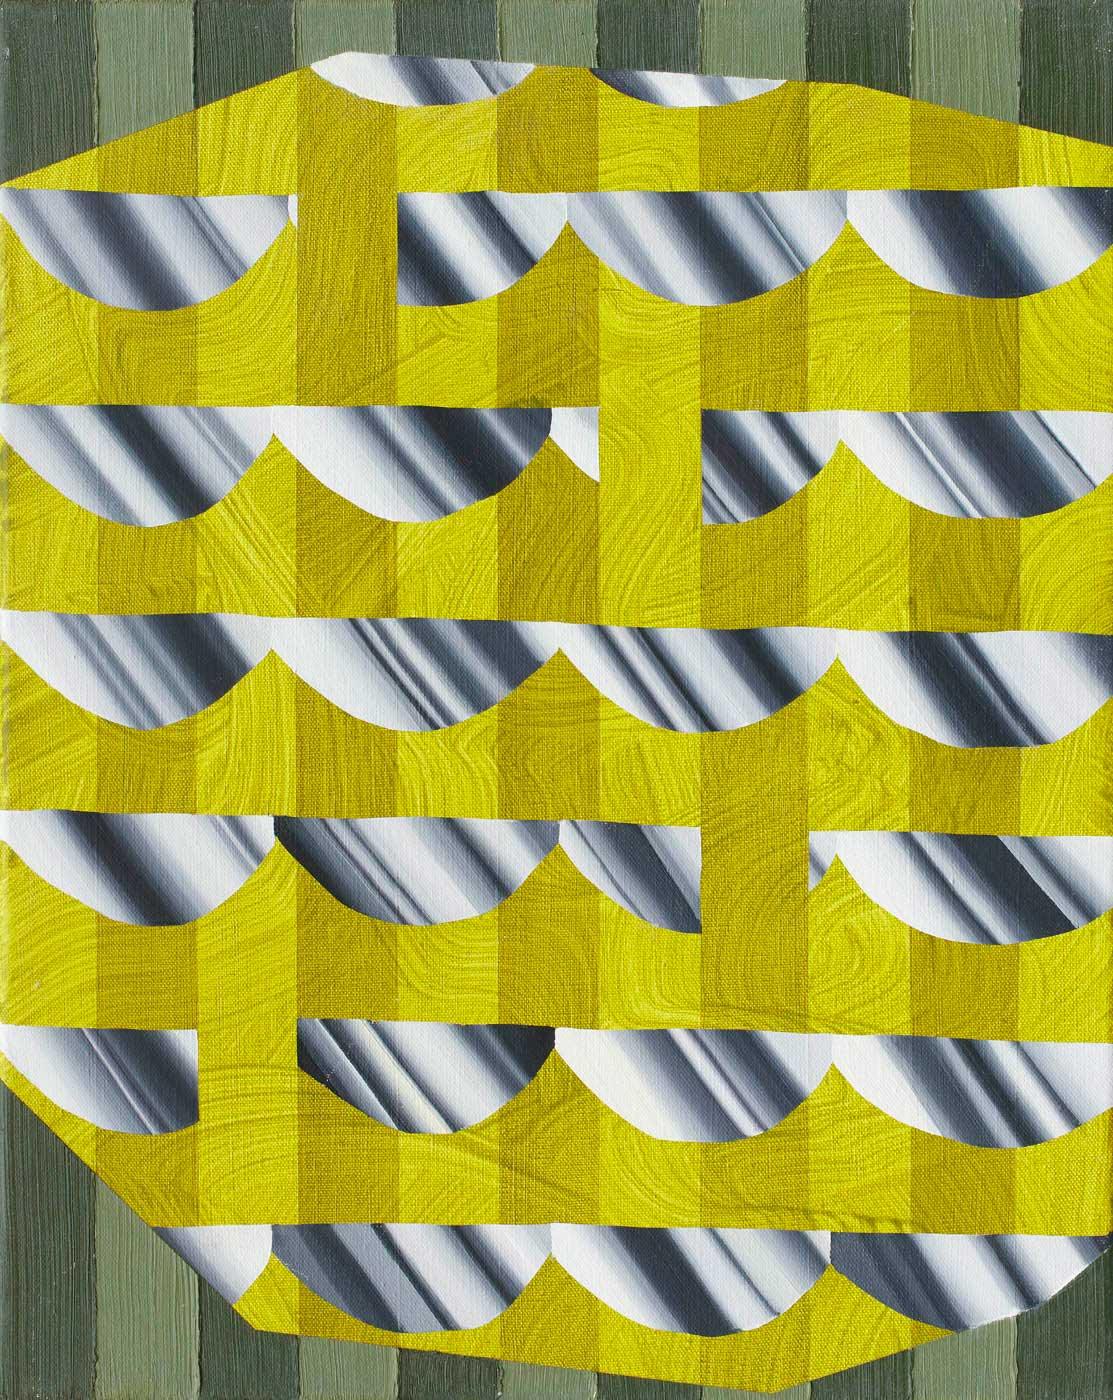 Rob W. Nicholls - Diagonal Fit